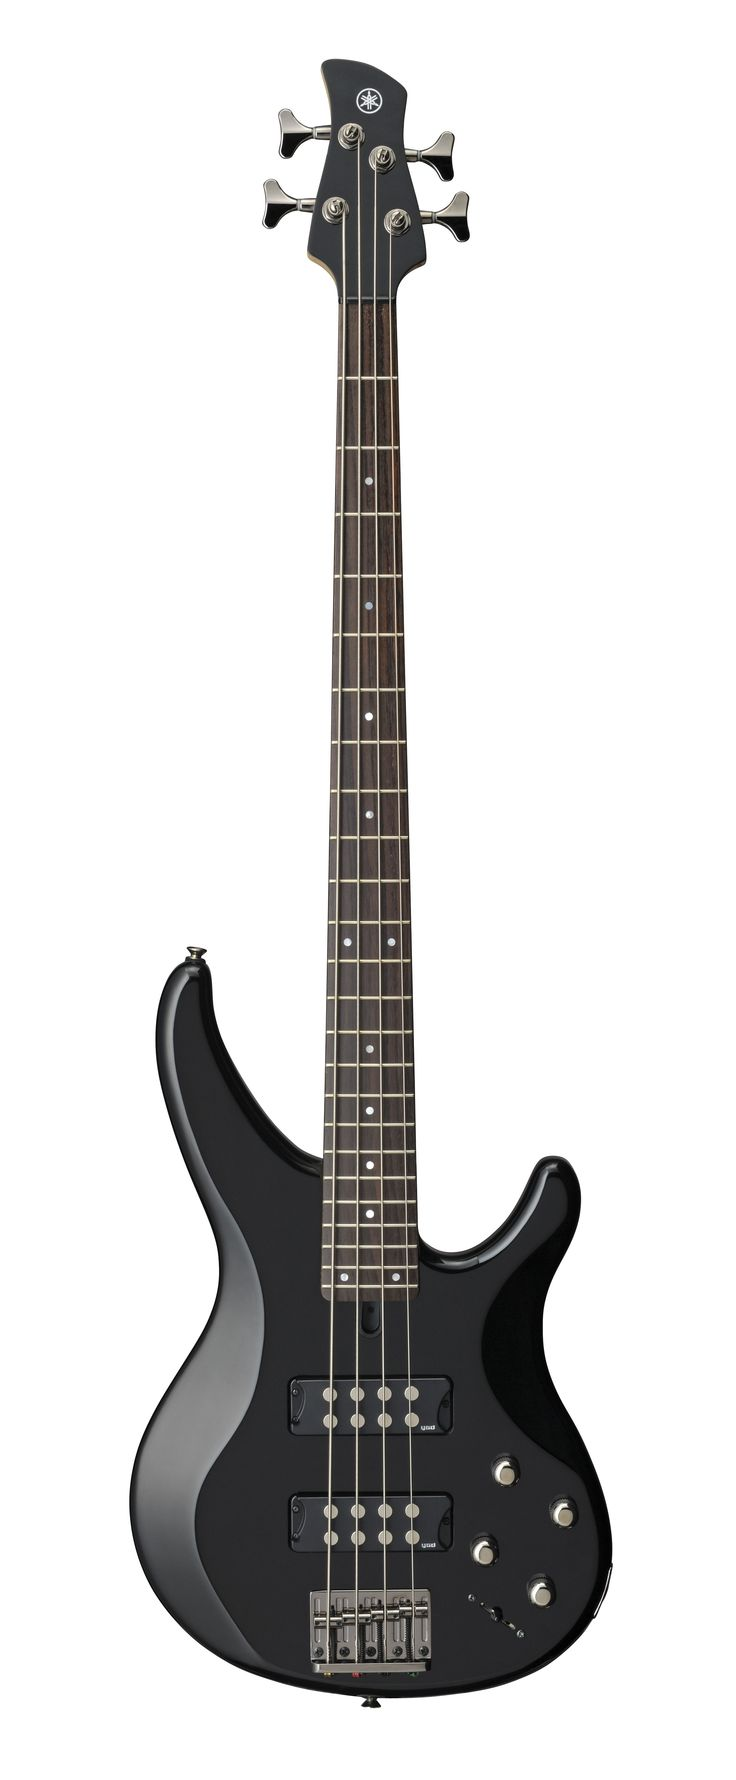 Yamaha TRBX304 bass guitar